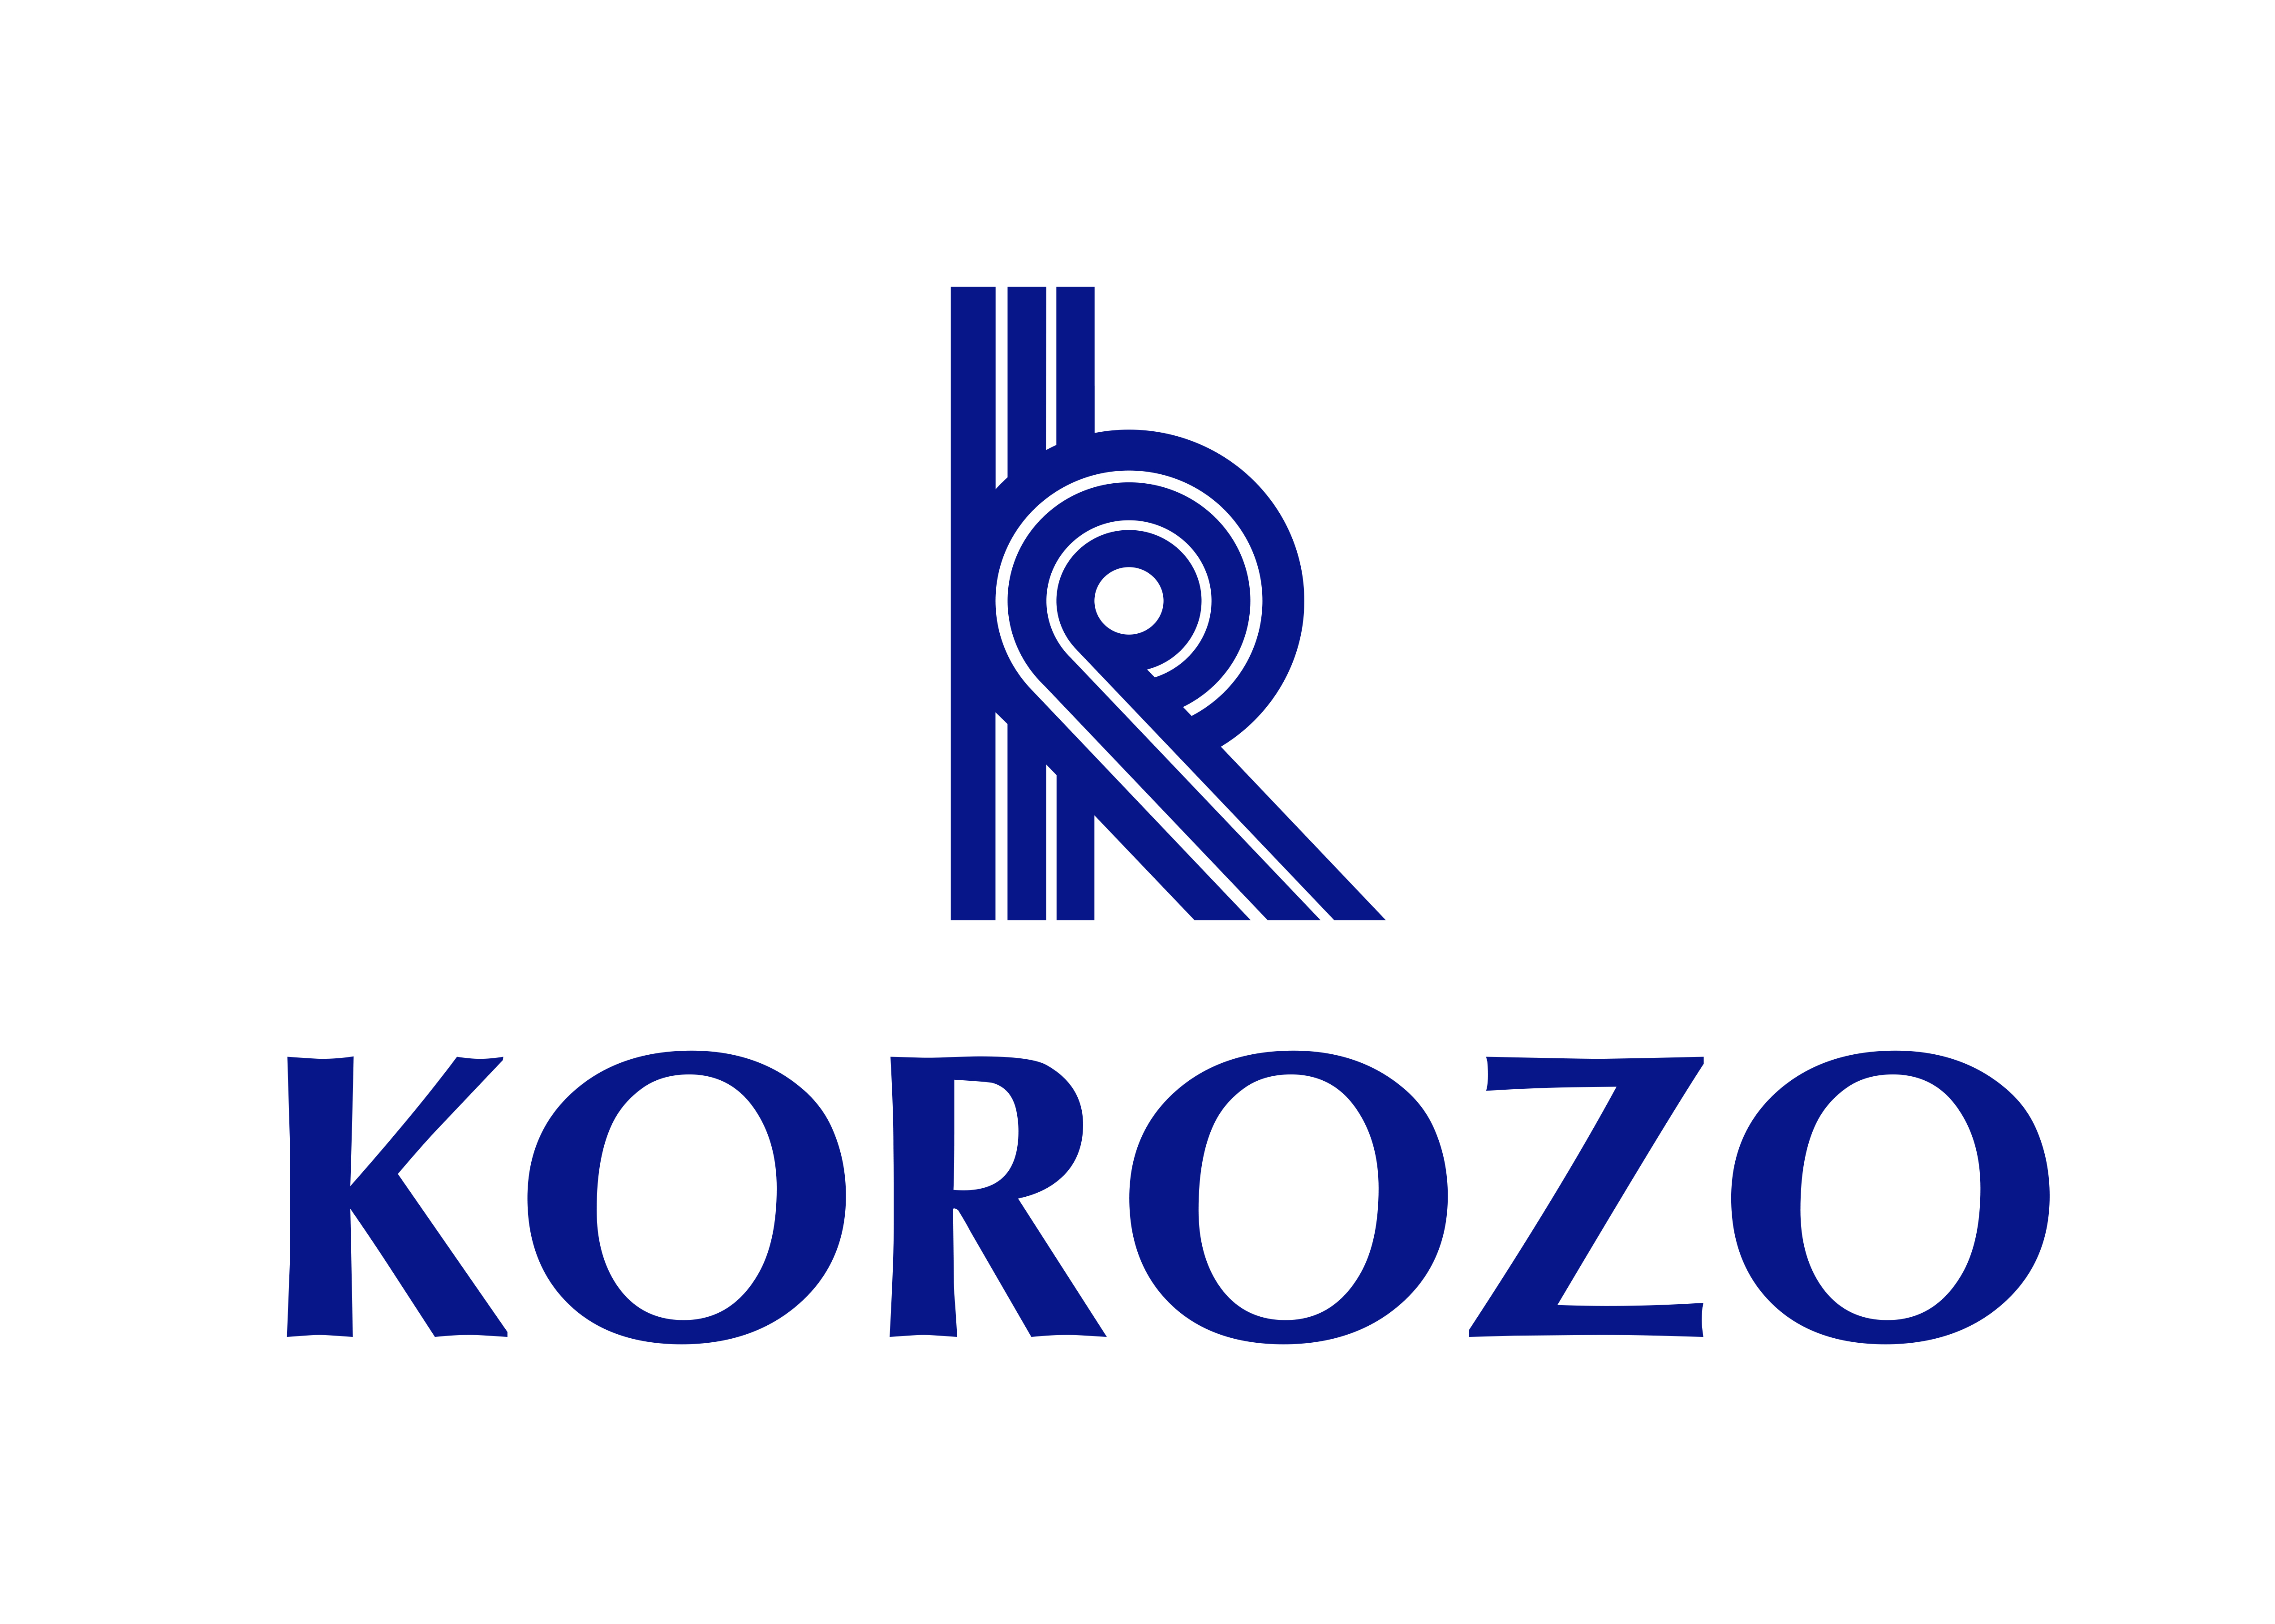 Korozo-logo